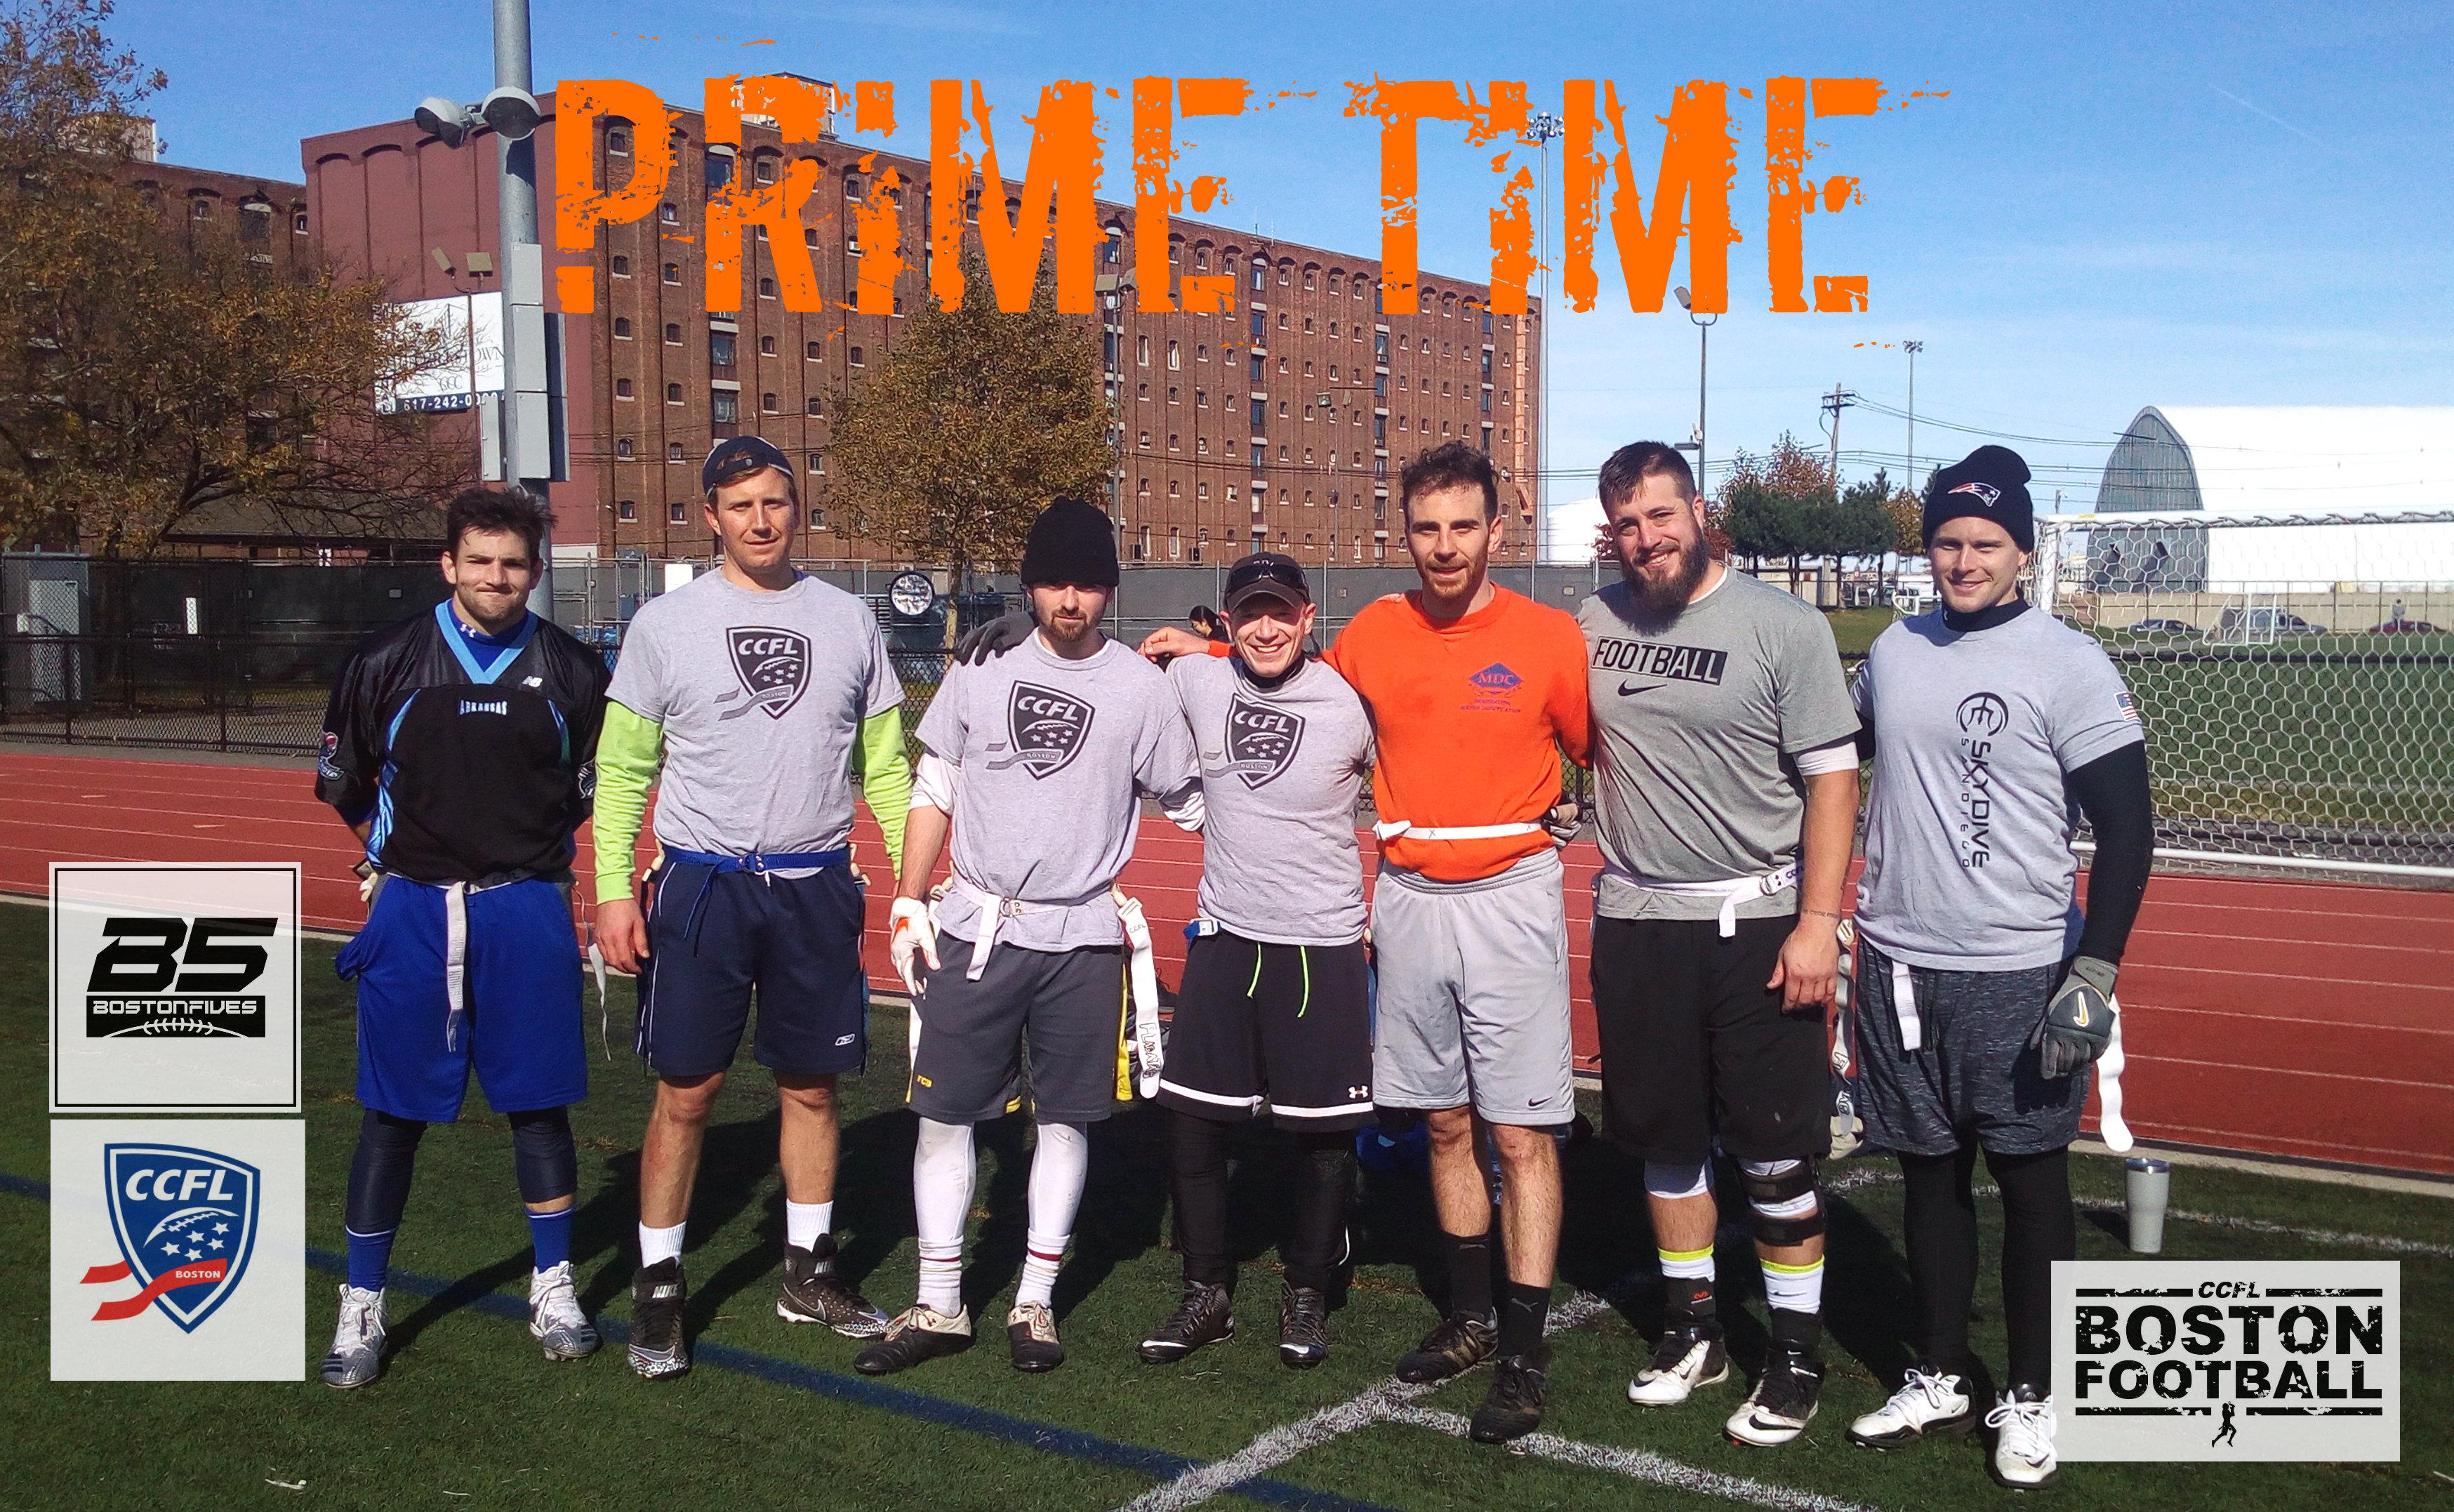 Prime Time Fall 2018